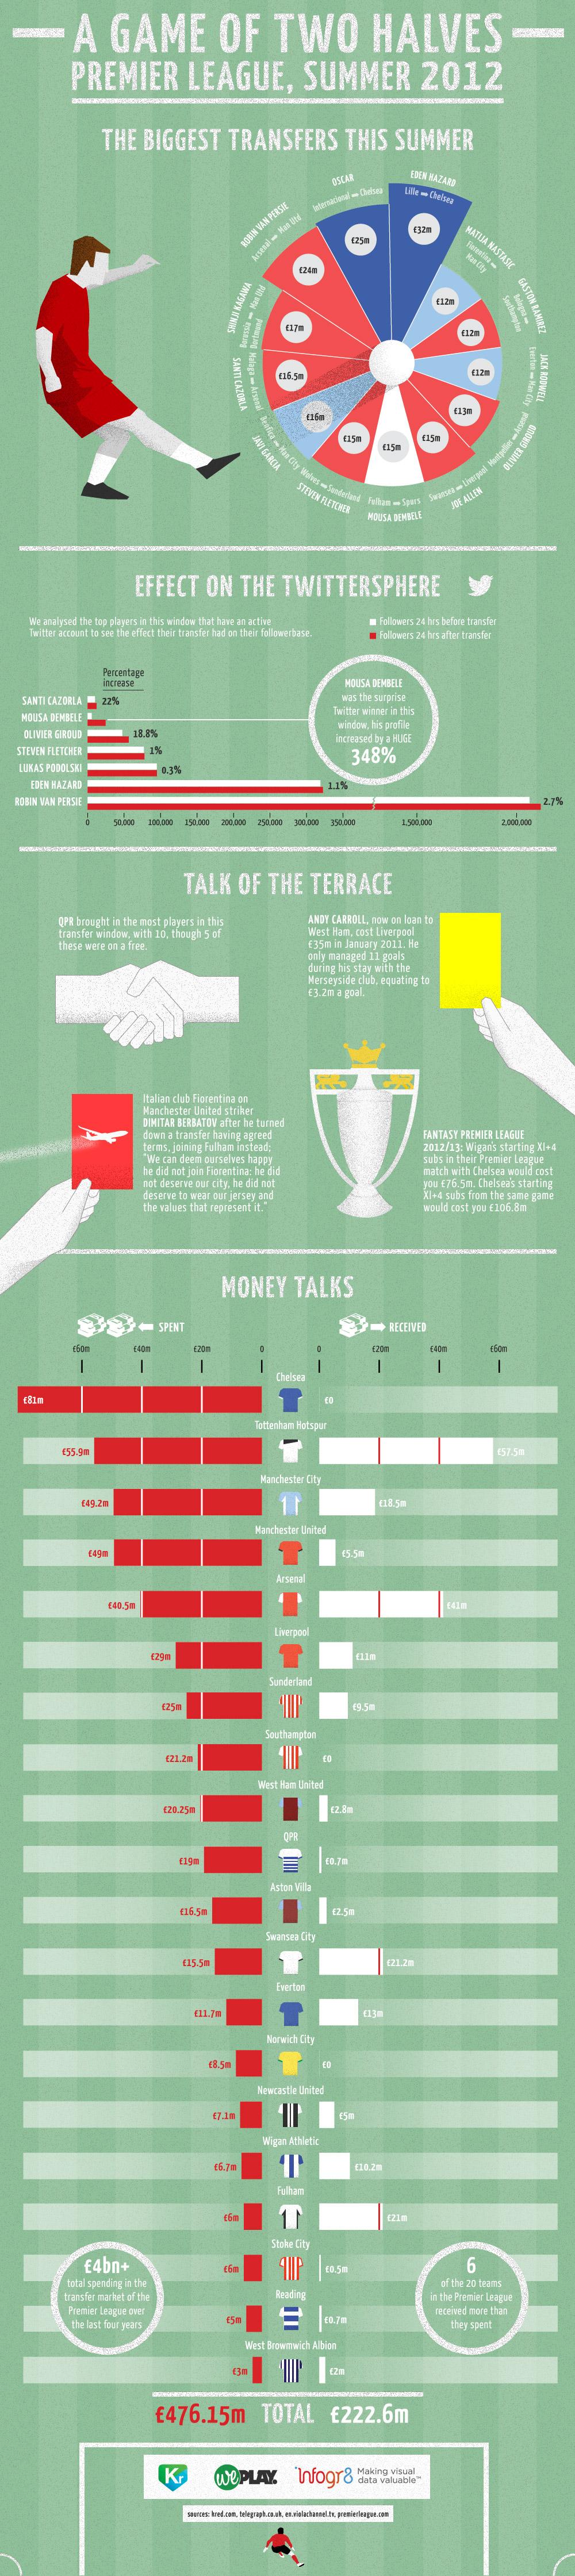 premier-league-summer-2012-transfer-window-infographic_5044a6930d2cf